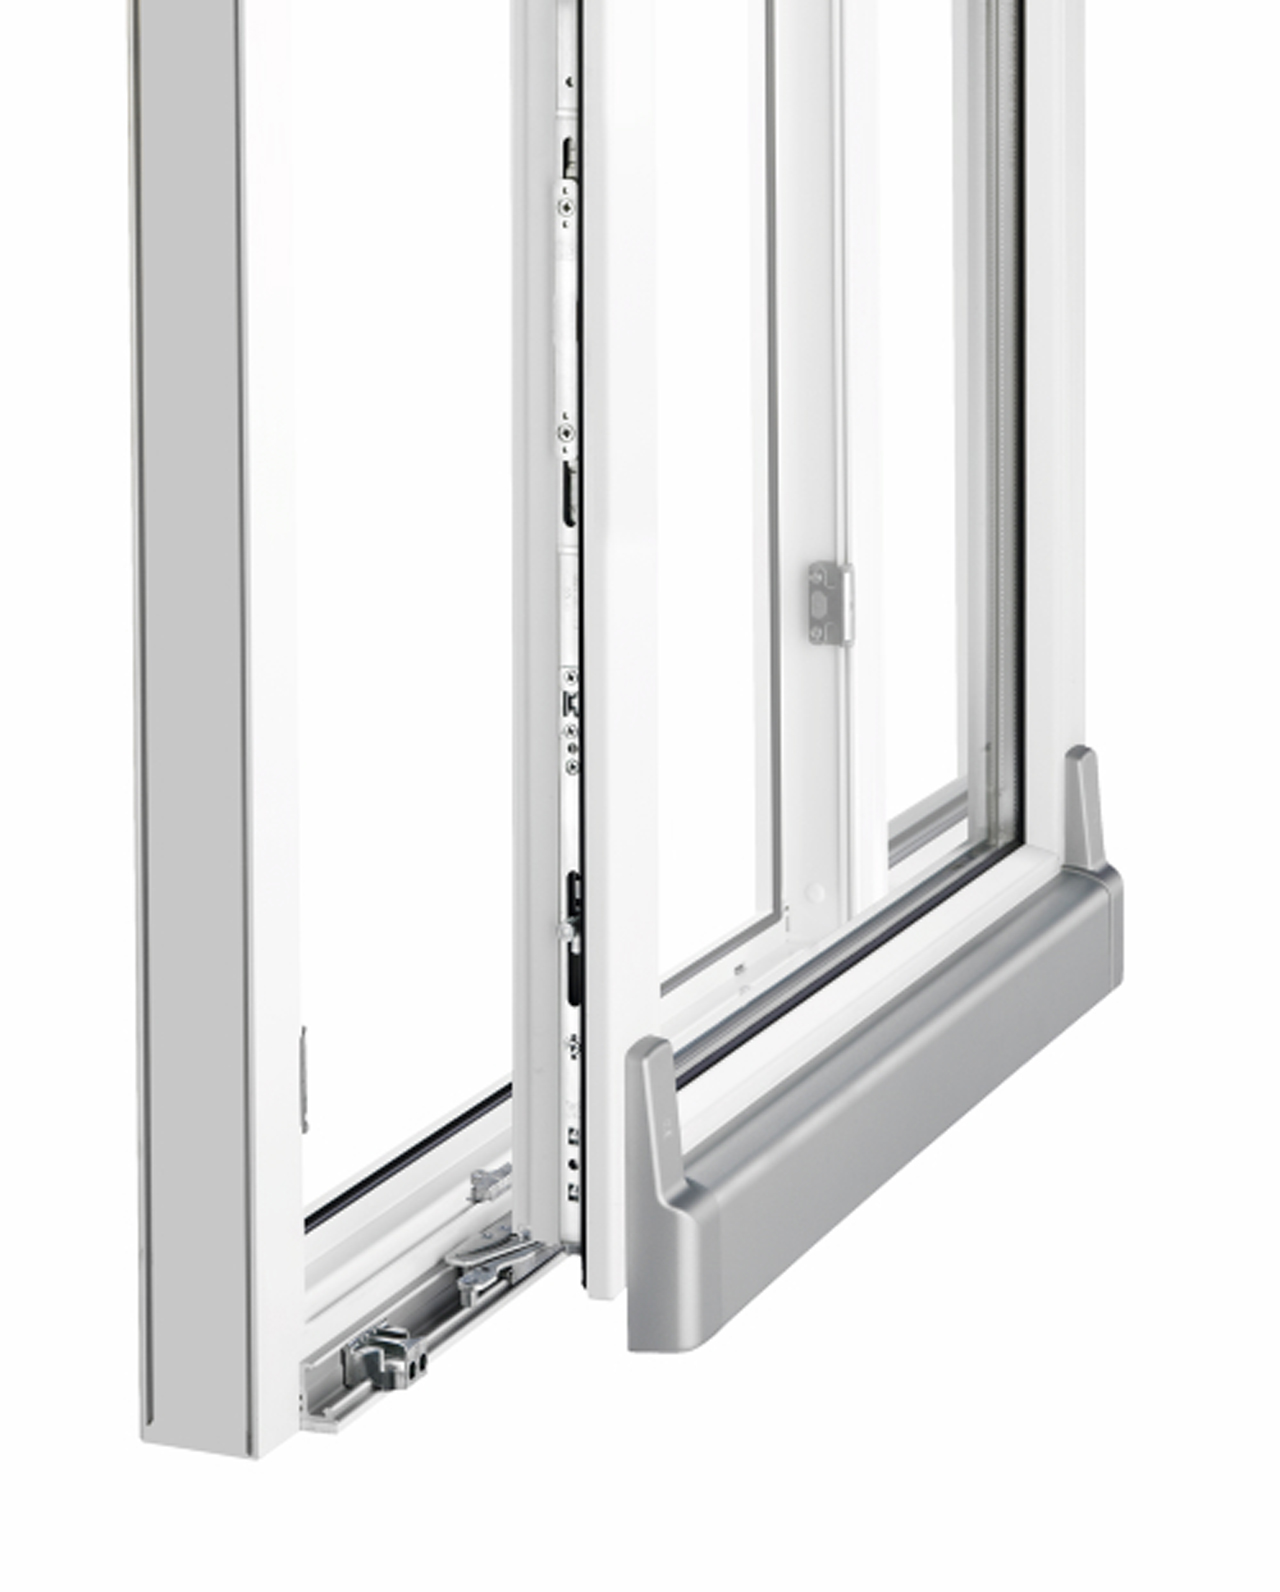 Mb fensterfabriken parallel schiebe kipp t r psk for Schiebefenster konfigurator